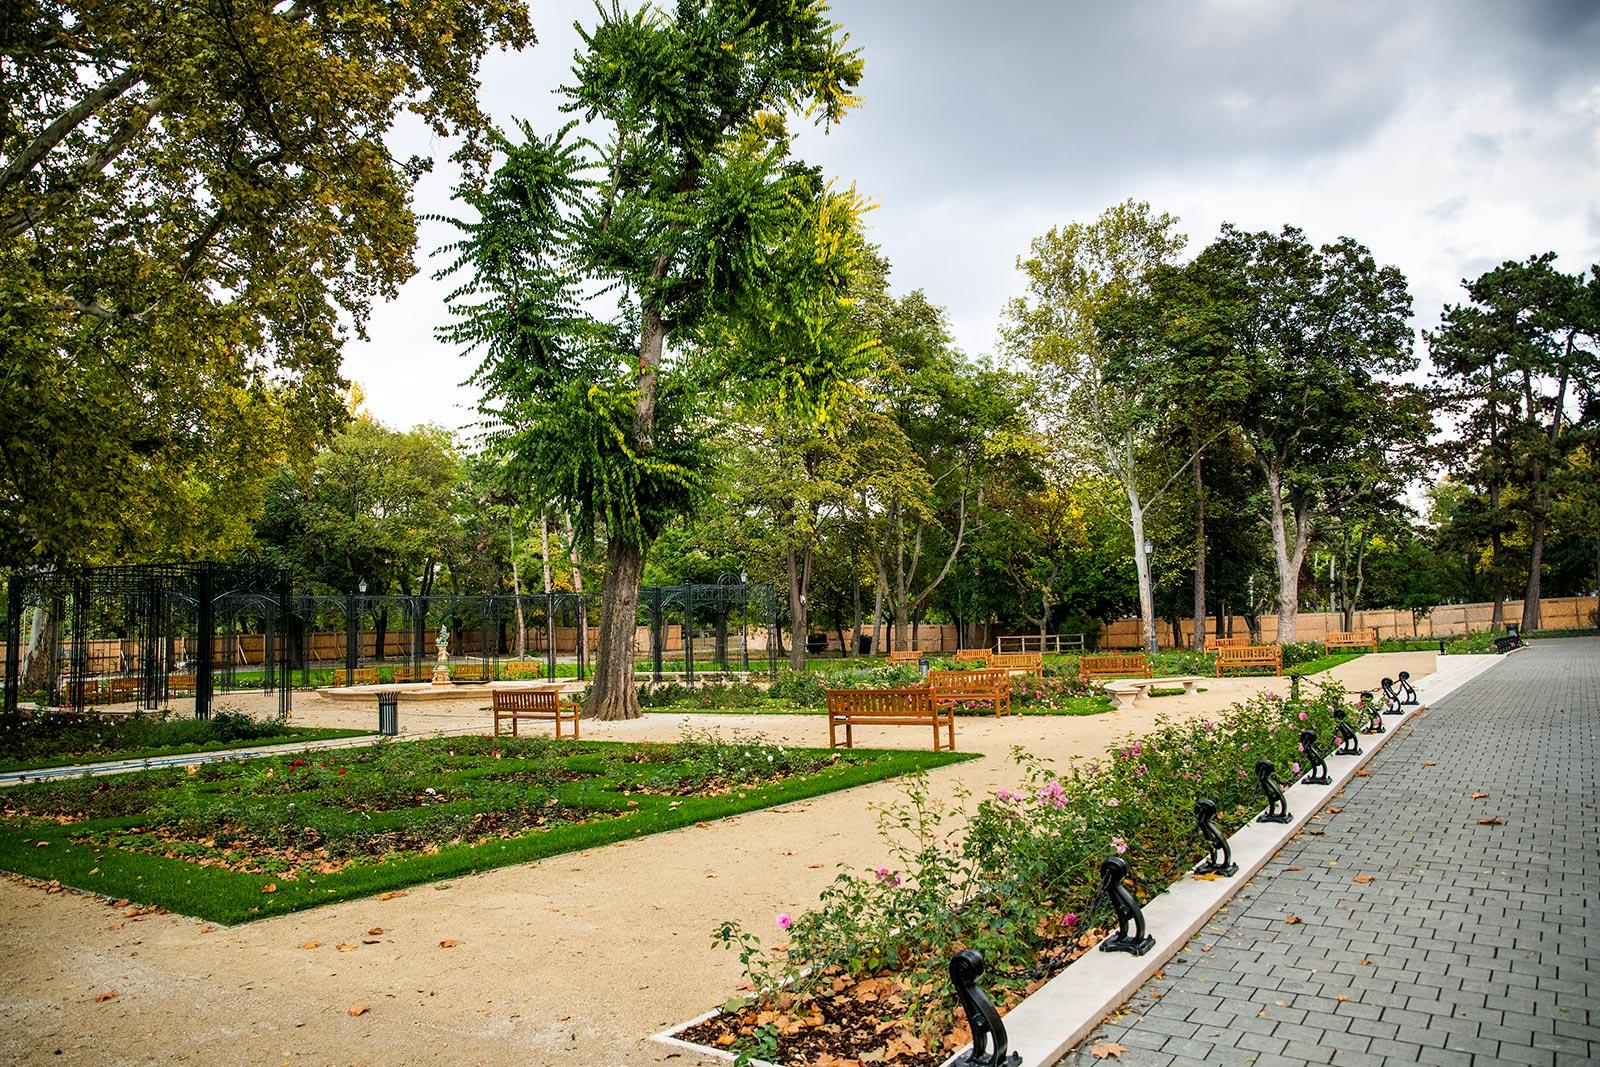 Bancos de madera en parque de Budapest